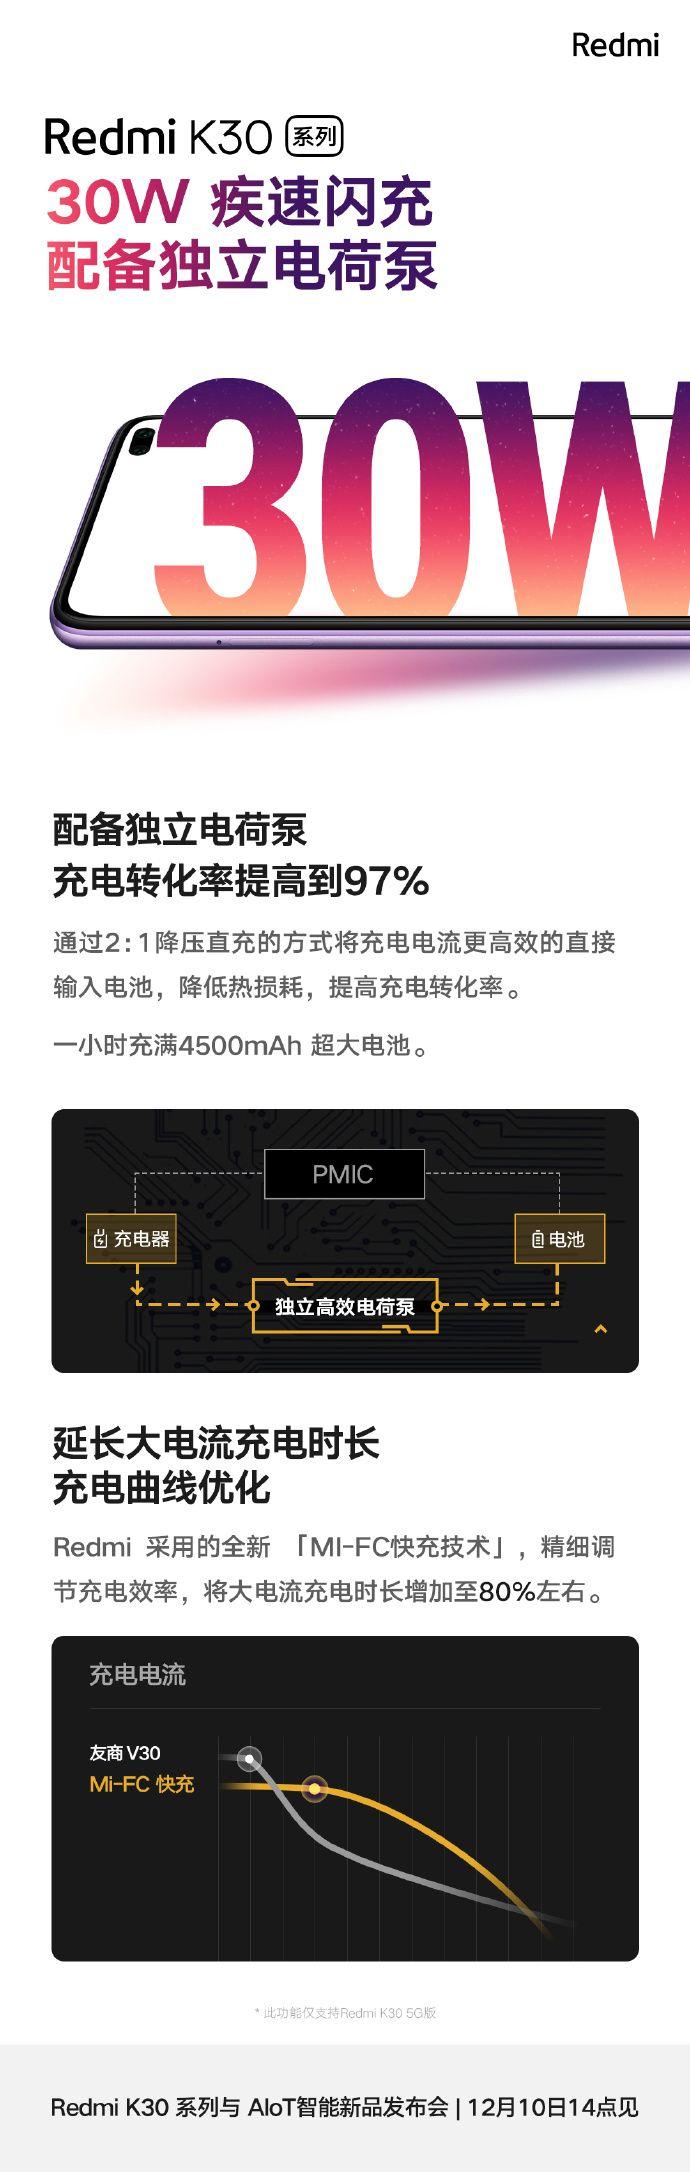 Названа емкость аккумулятора Redmi K30